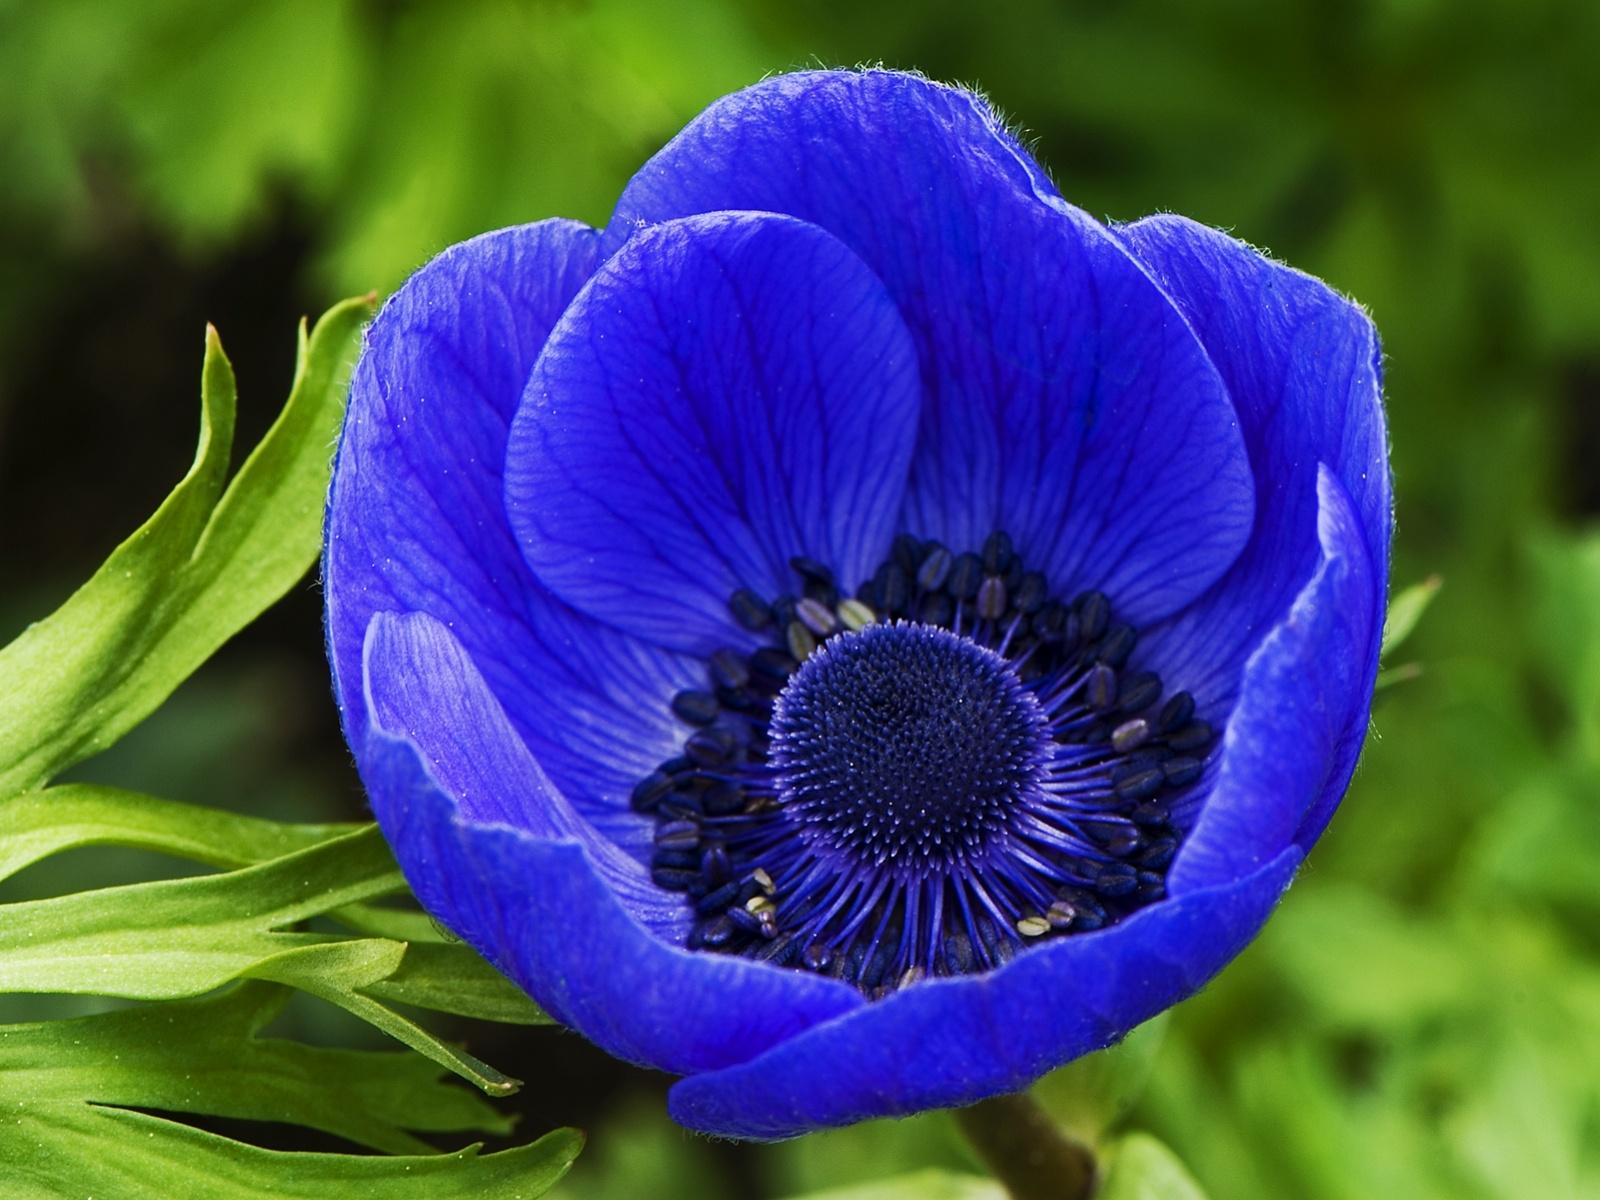 Free photo blue flower nature plants flowers free download blue flower photo izmirmasajfo